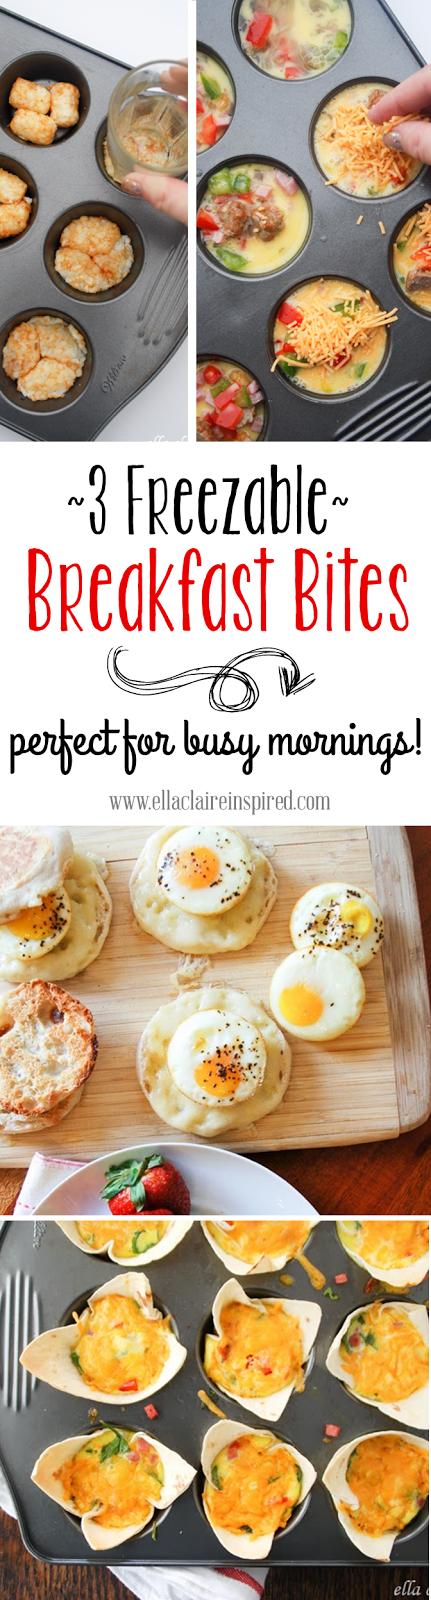 3 FREEZABLE BREAKFAST BITES | BUSY MORNING PREP!